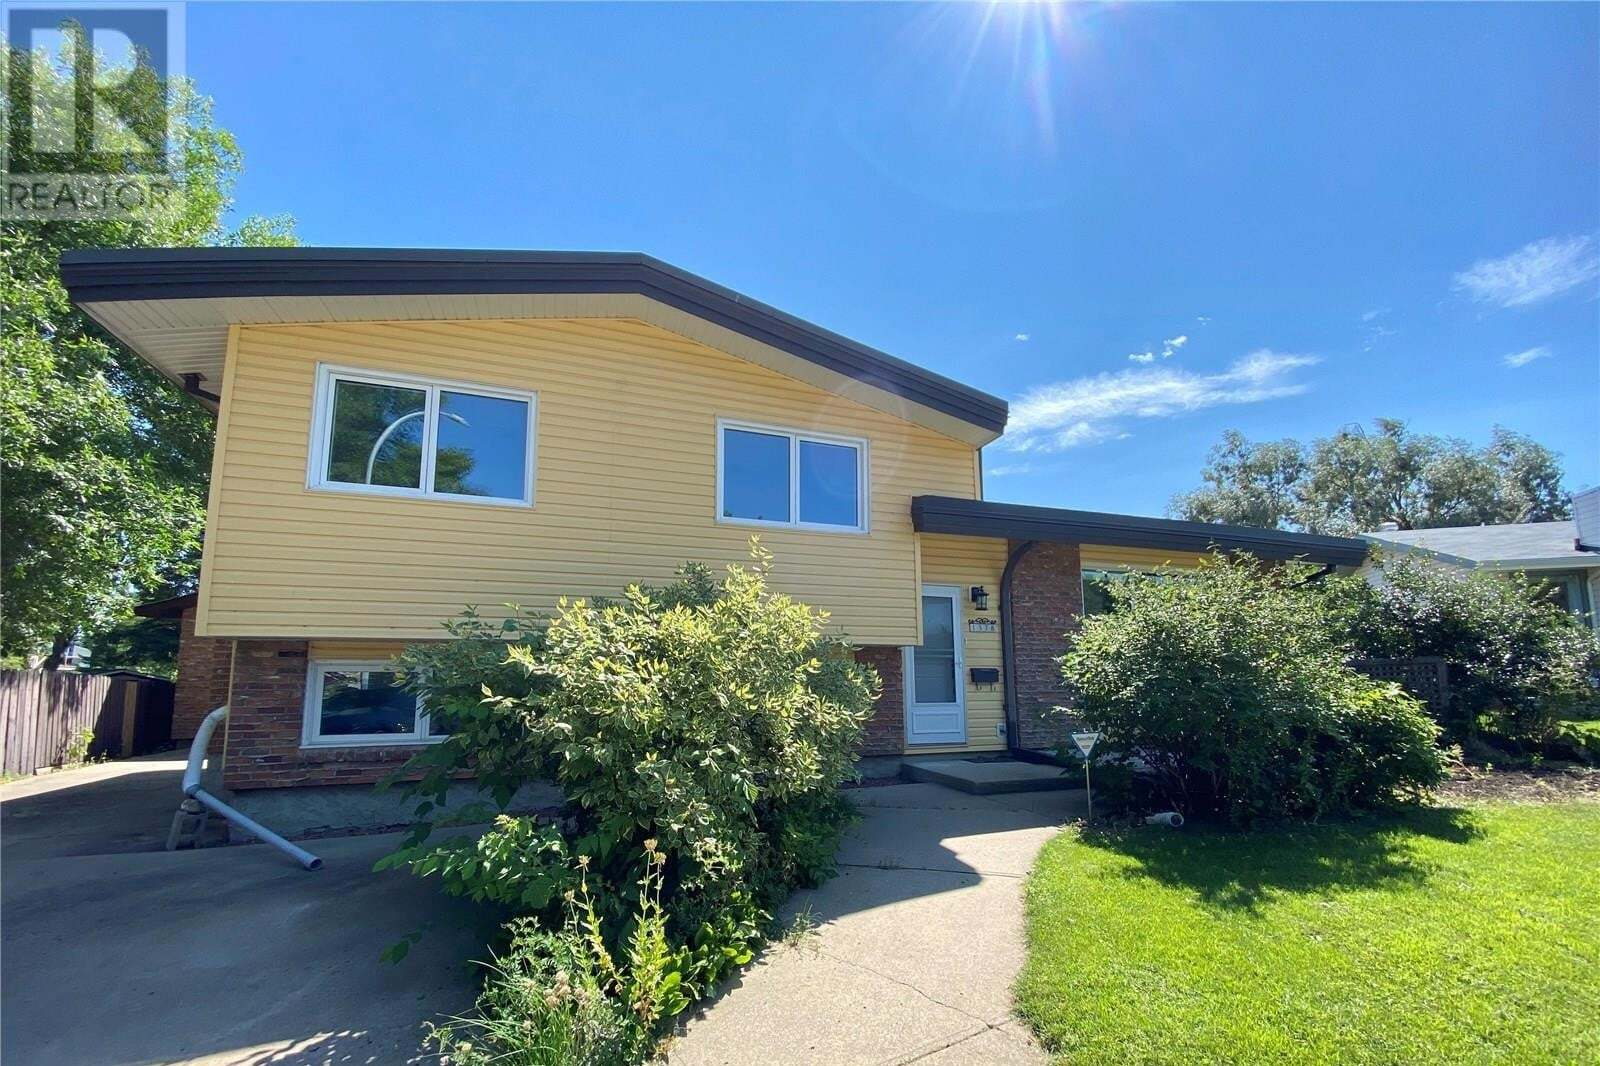 House for sale at 1578 Helme Cres Prince Albert Saskatchewan - MLS: SK821417